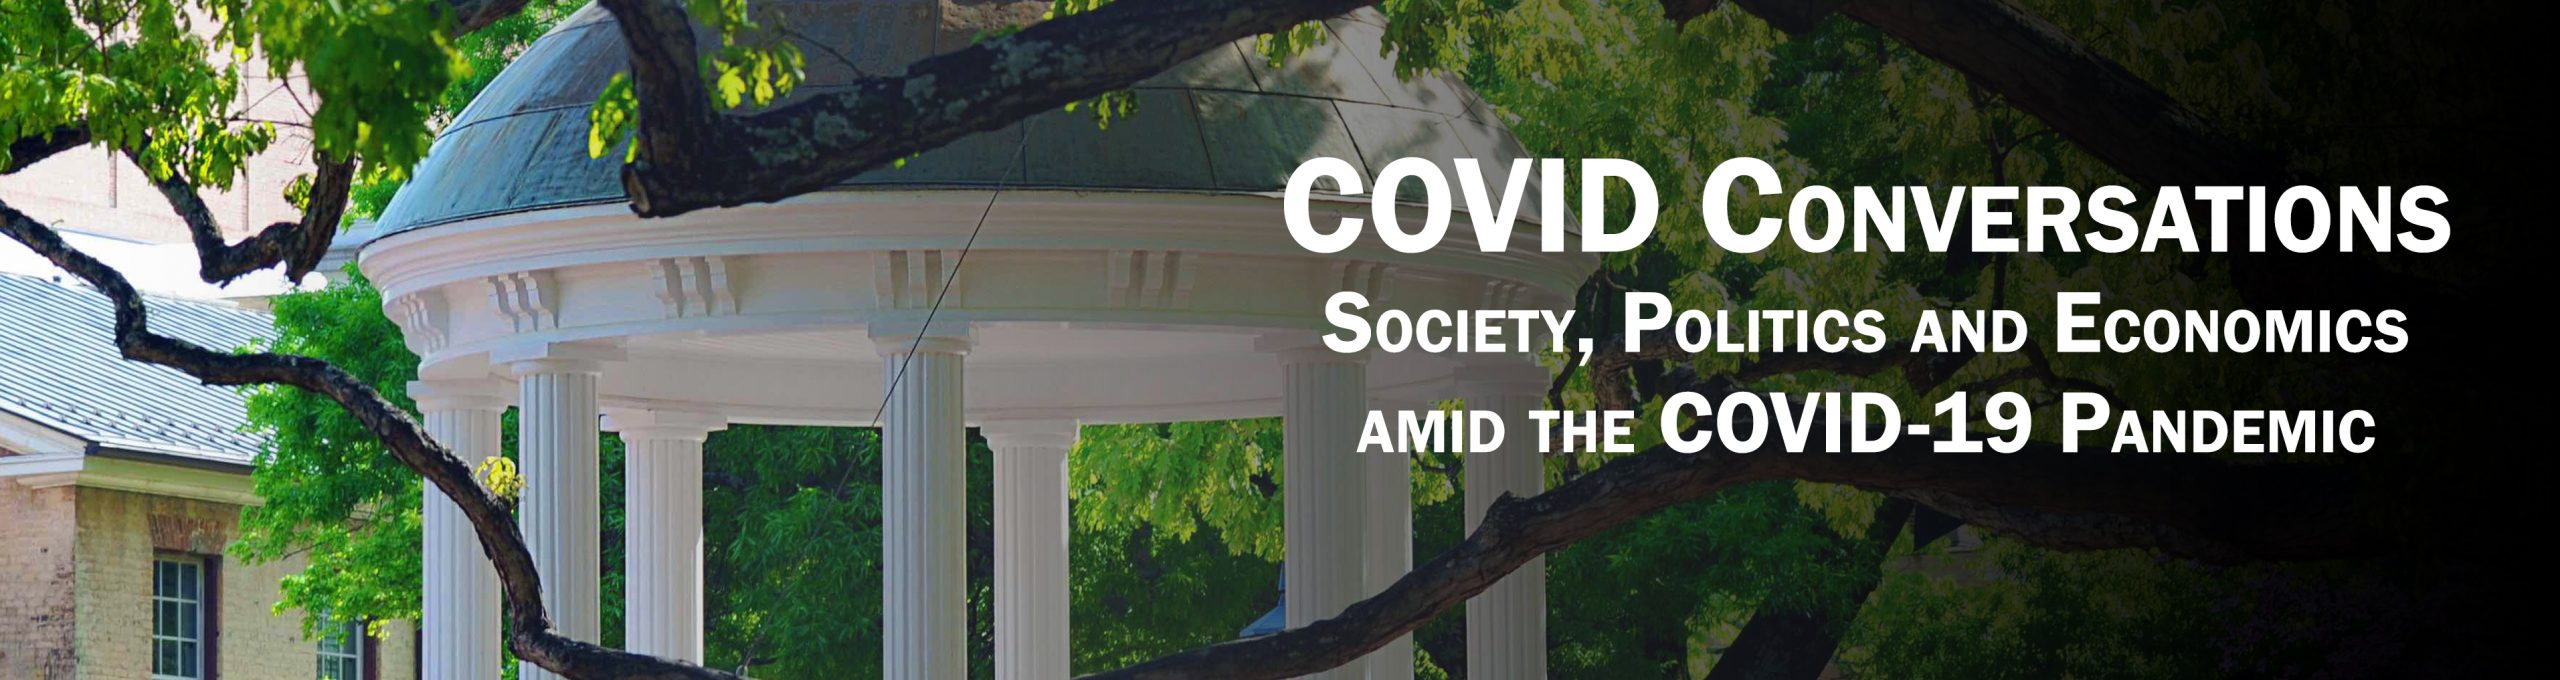 COVID Conversations: Society, Politics and Economics amid the COVID-19 Pandemic